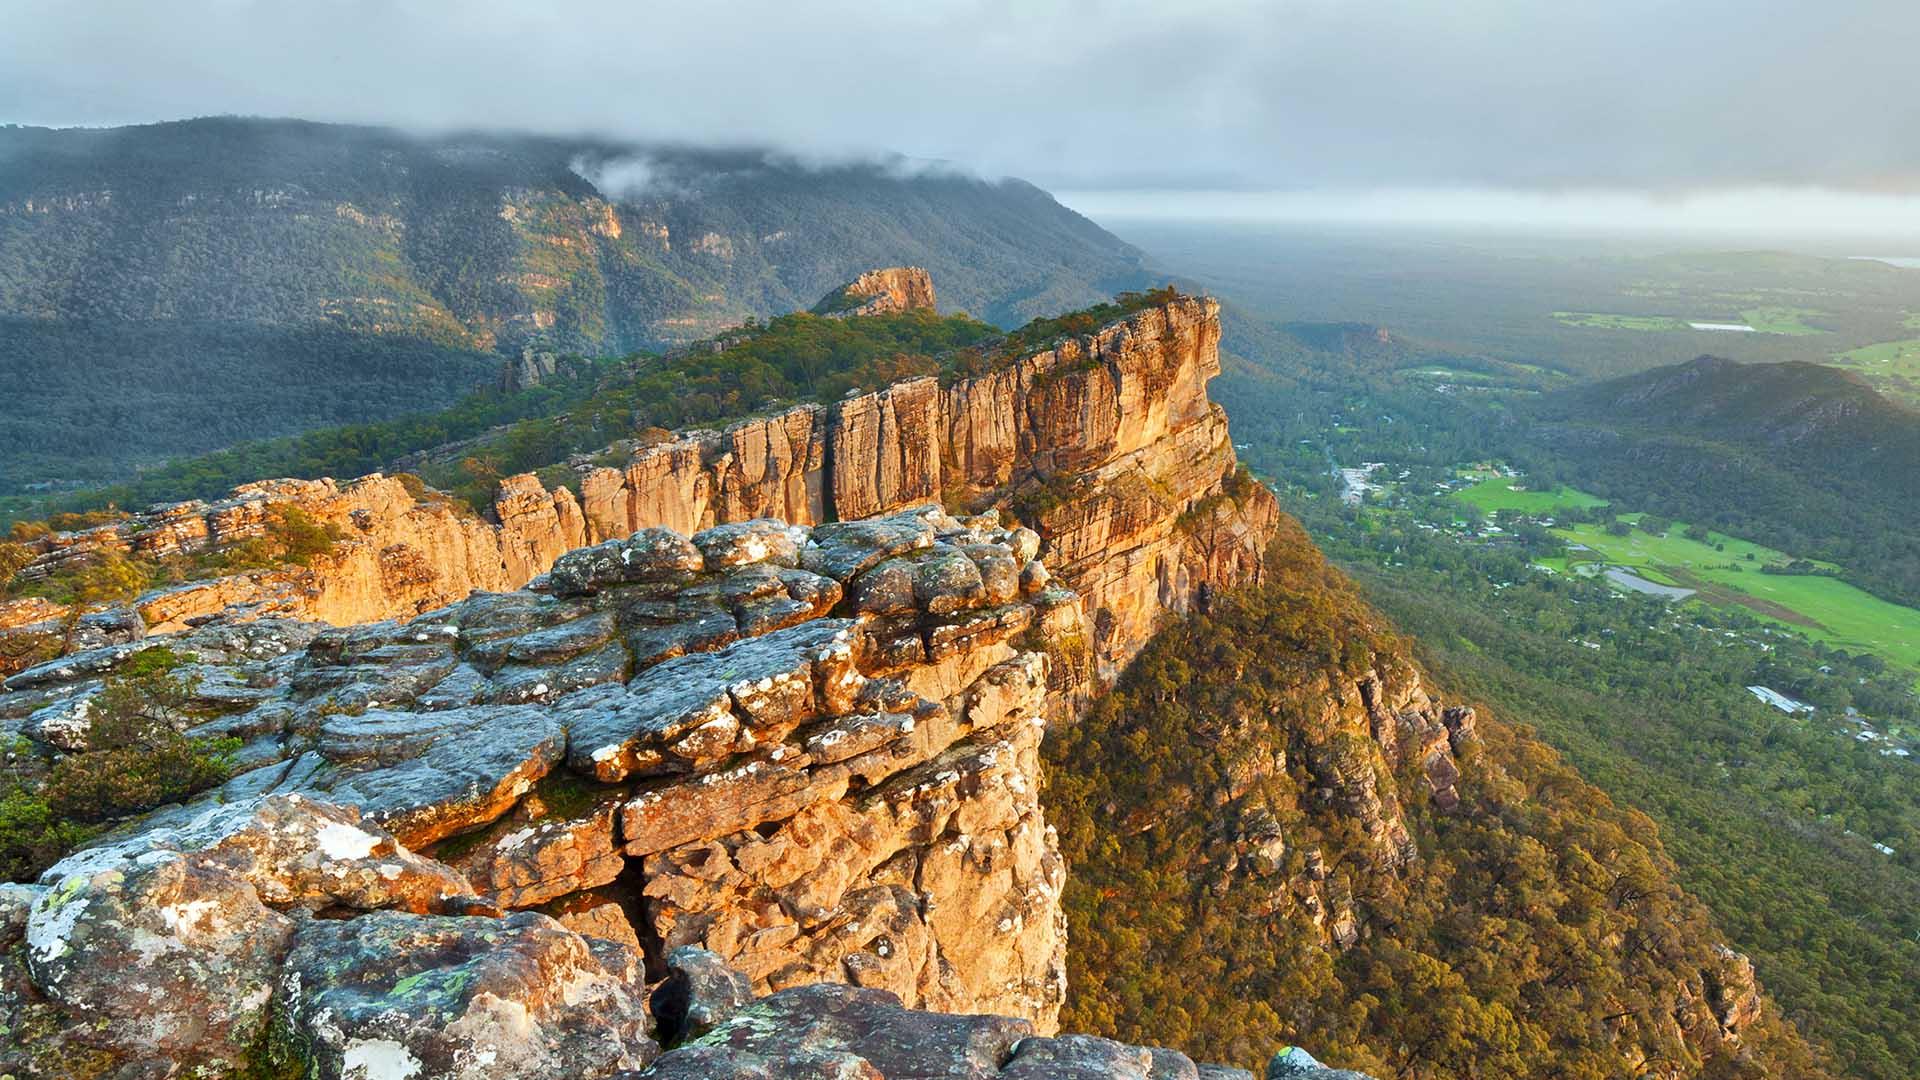 Relphs Peak